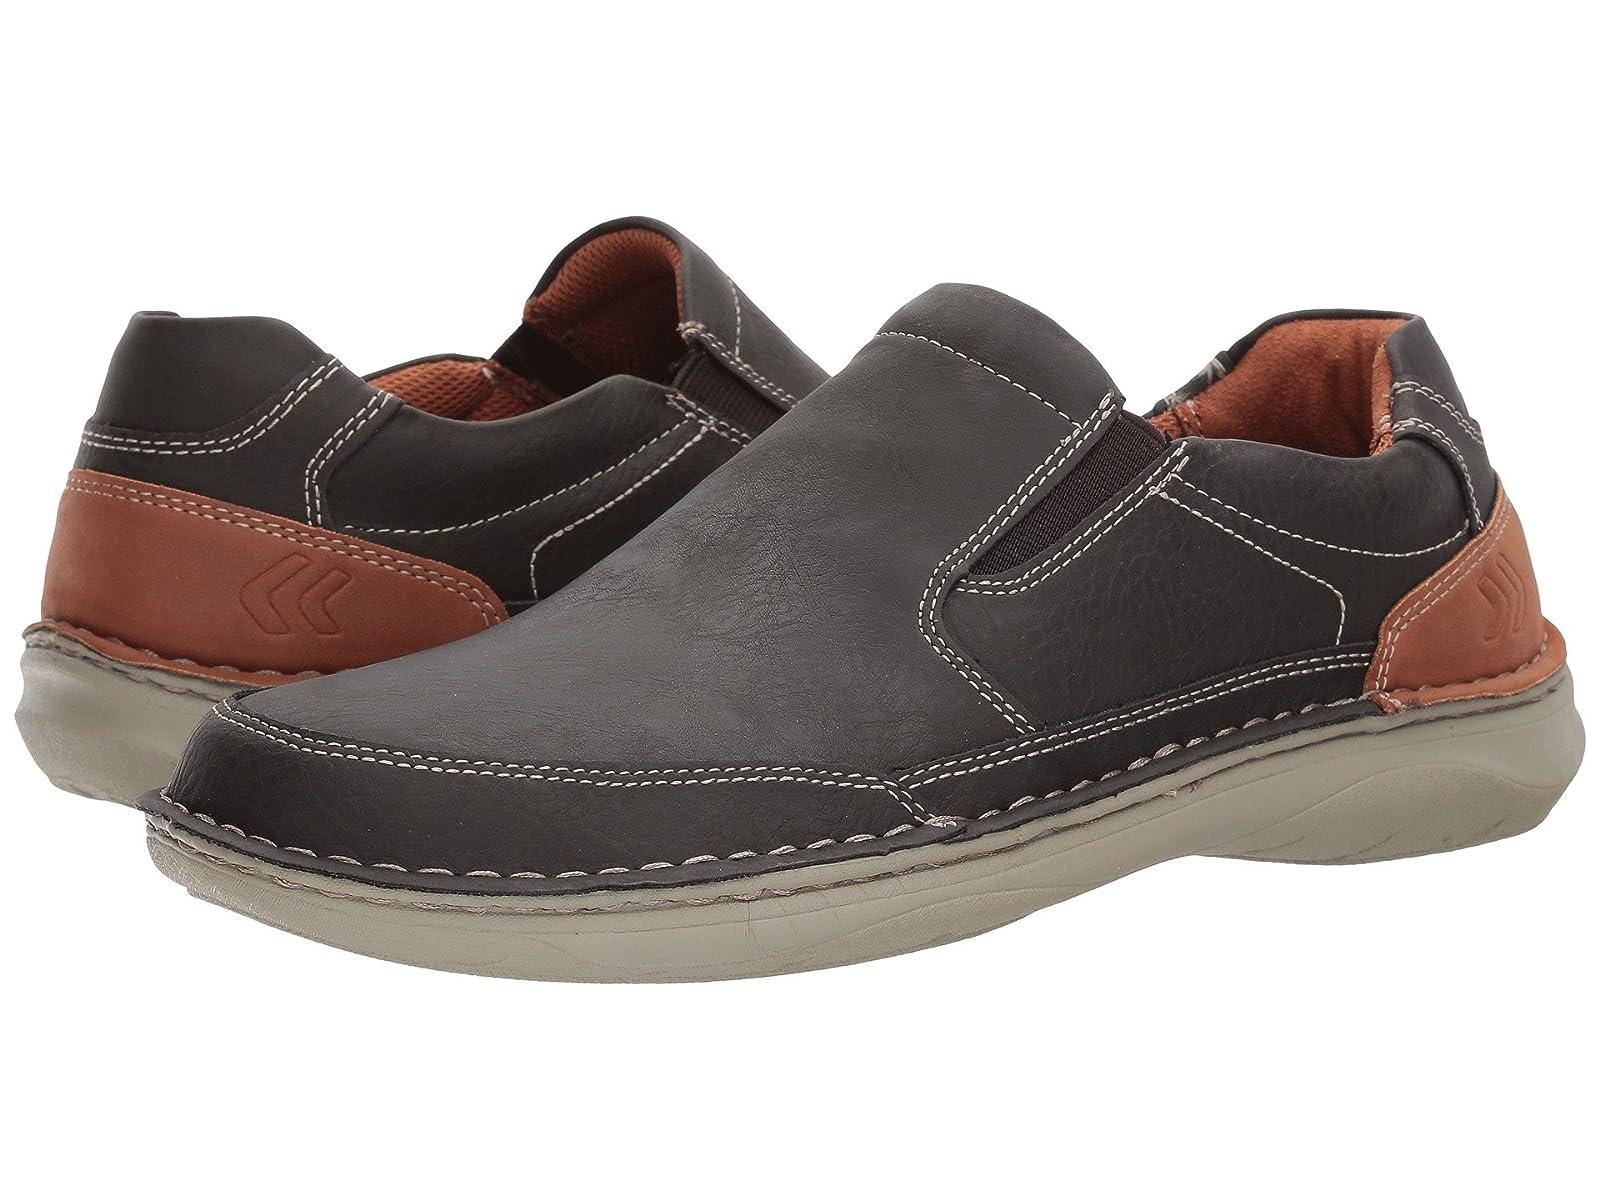 Dr. Scholl's CortonaCheap and distinctive eye-catching shoes